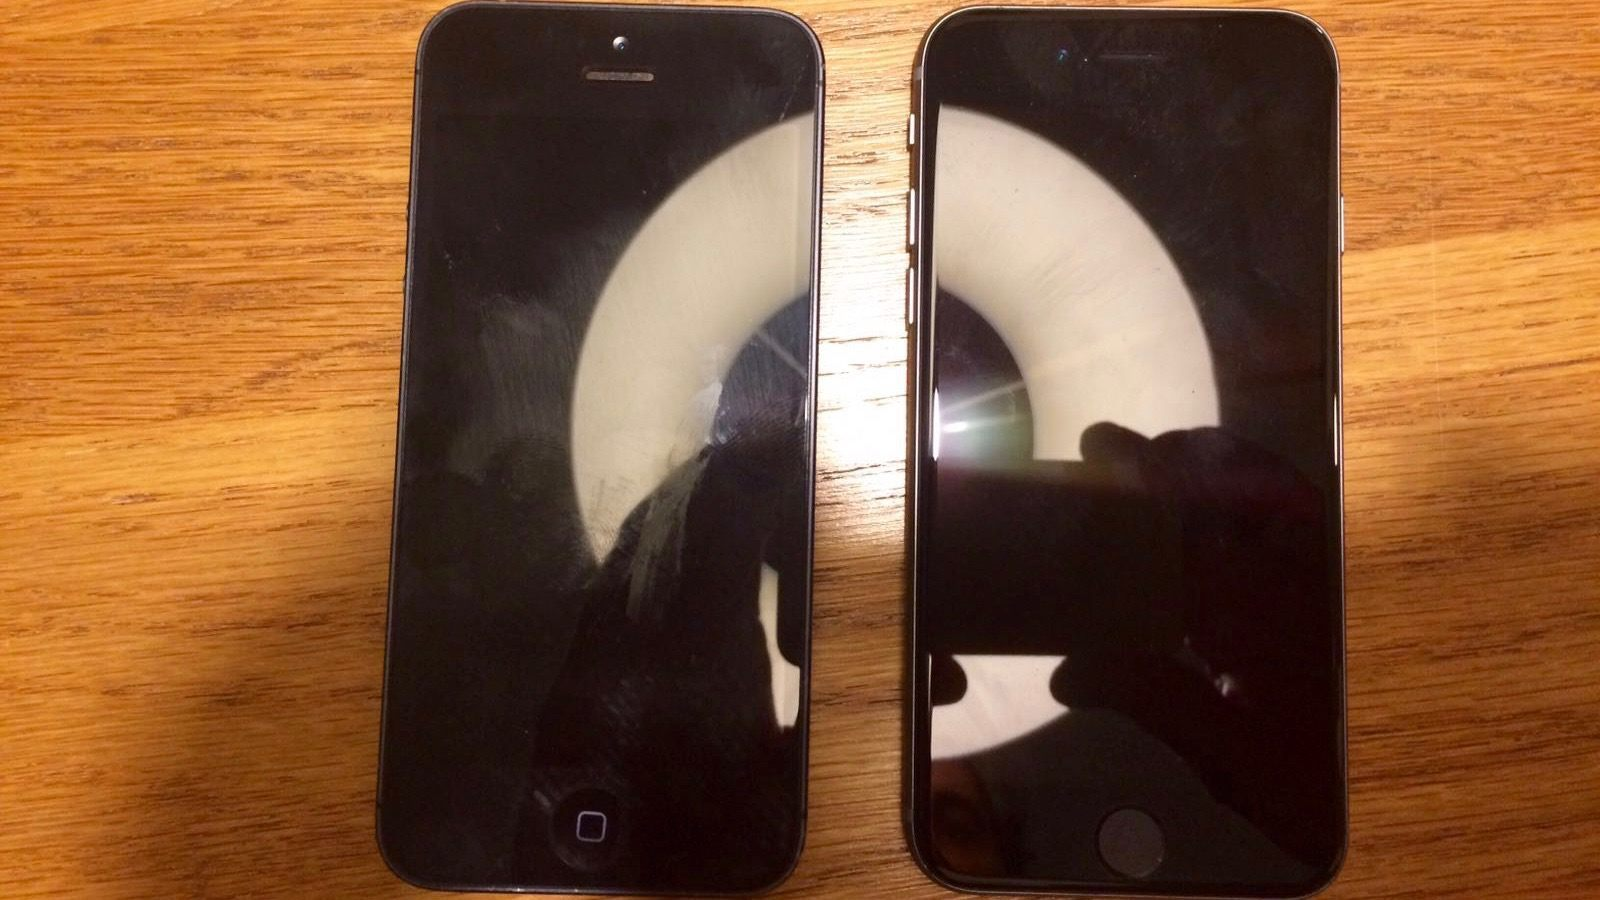 4 inç iphone